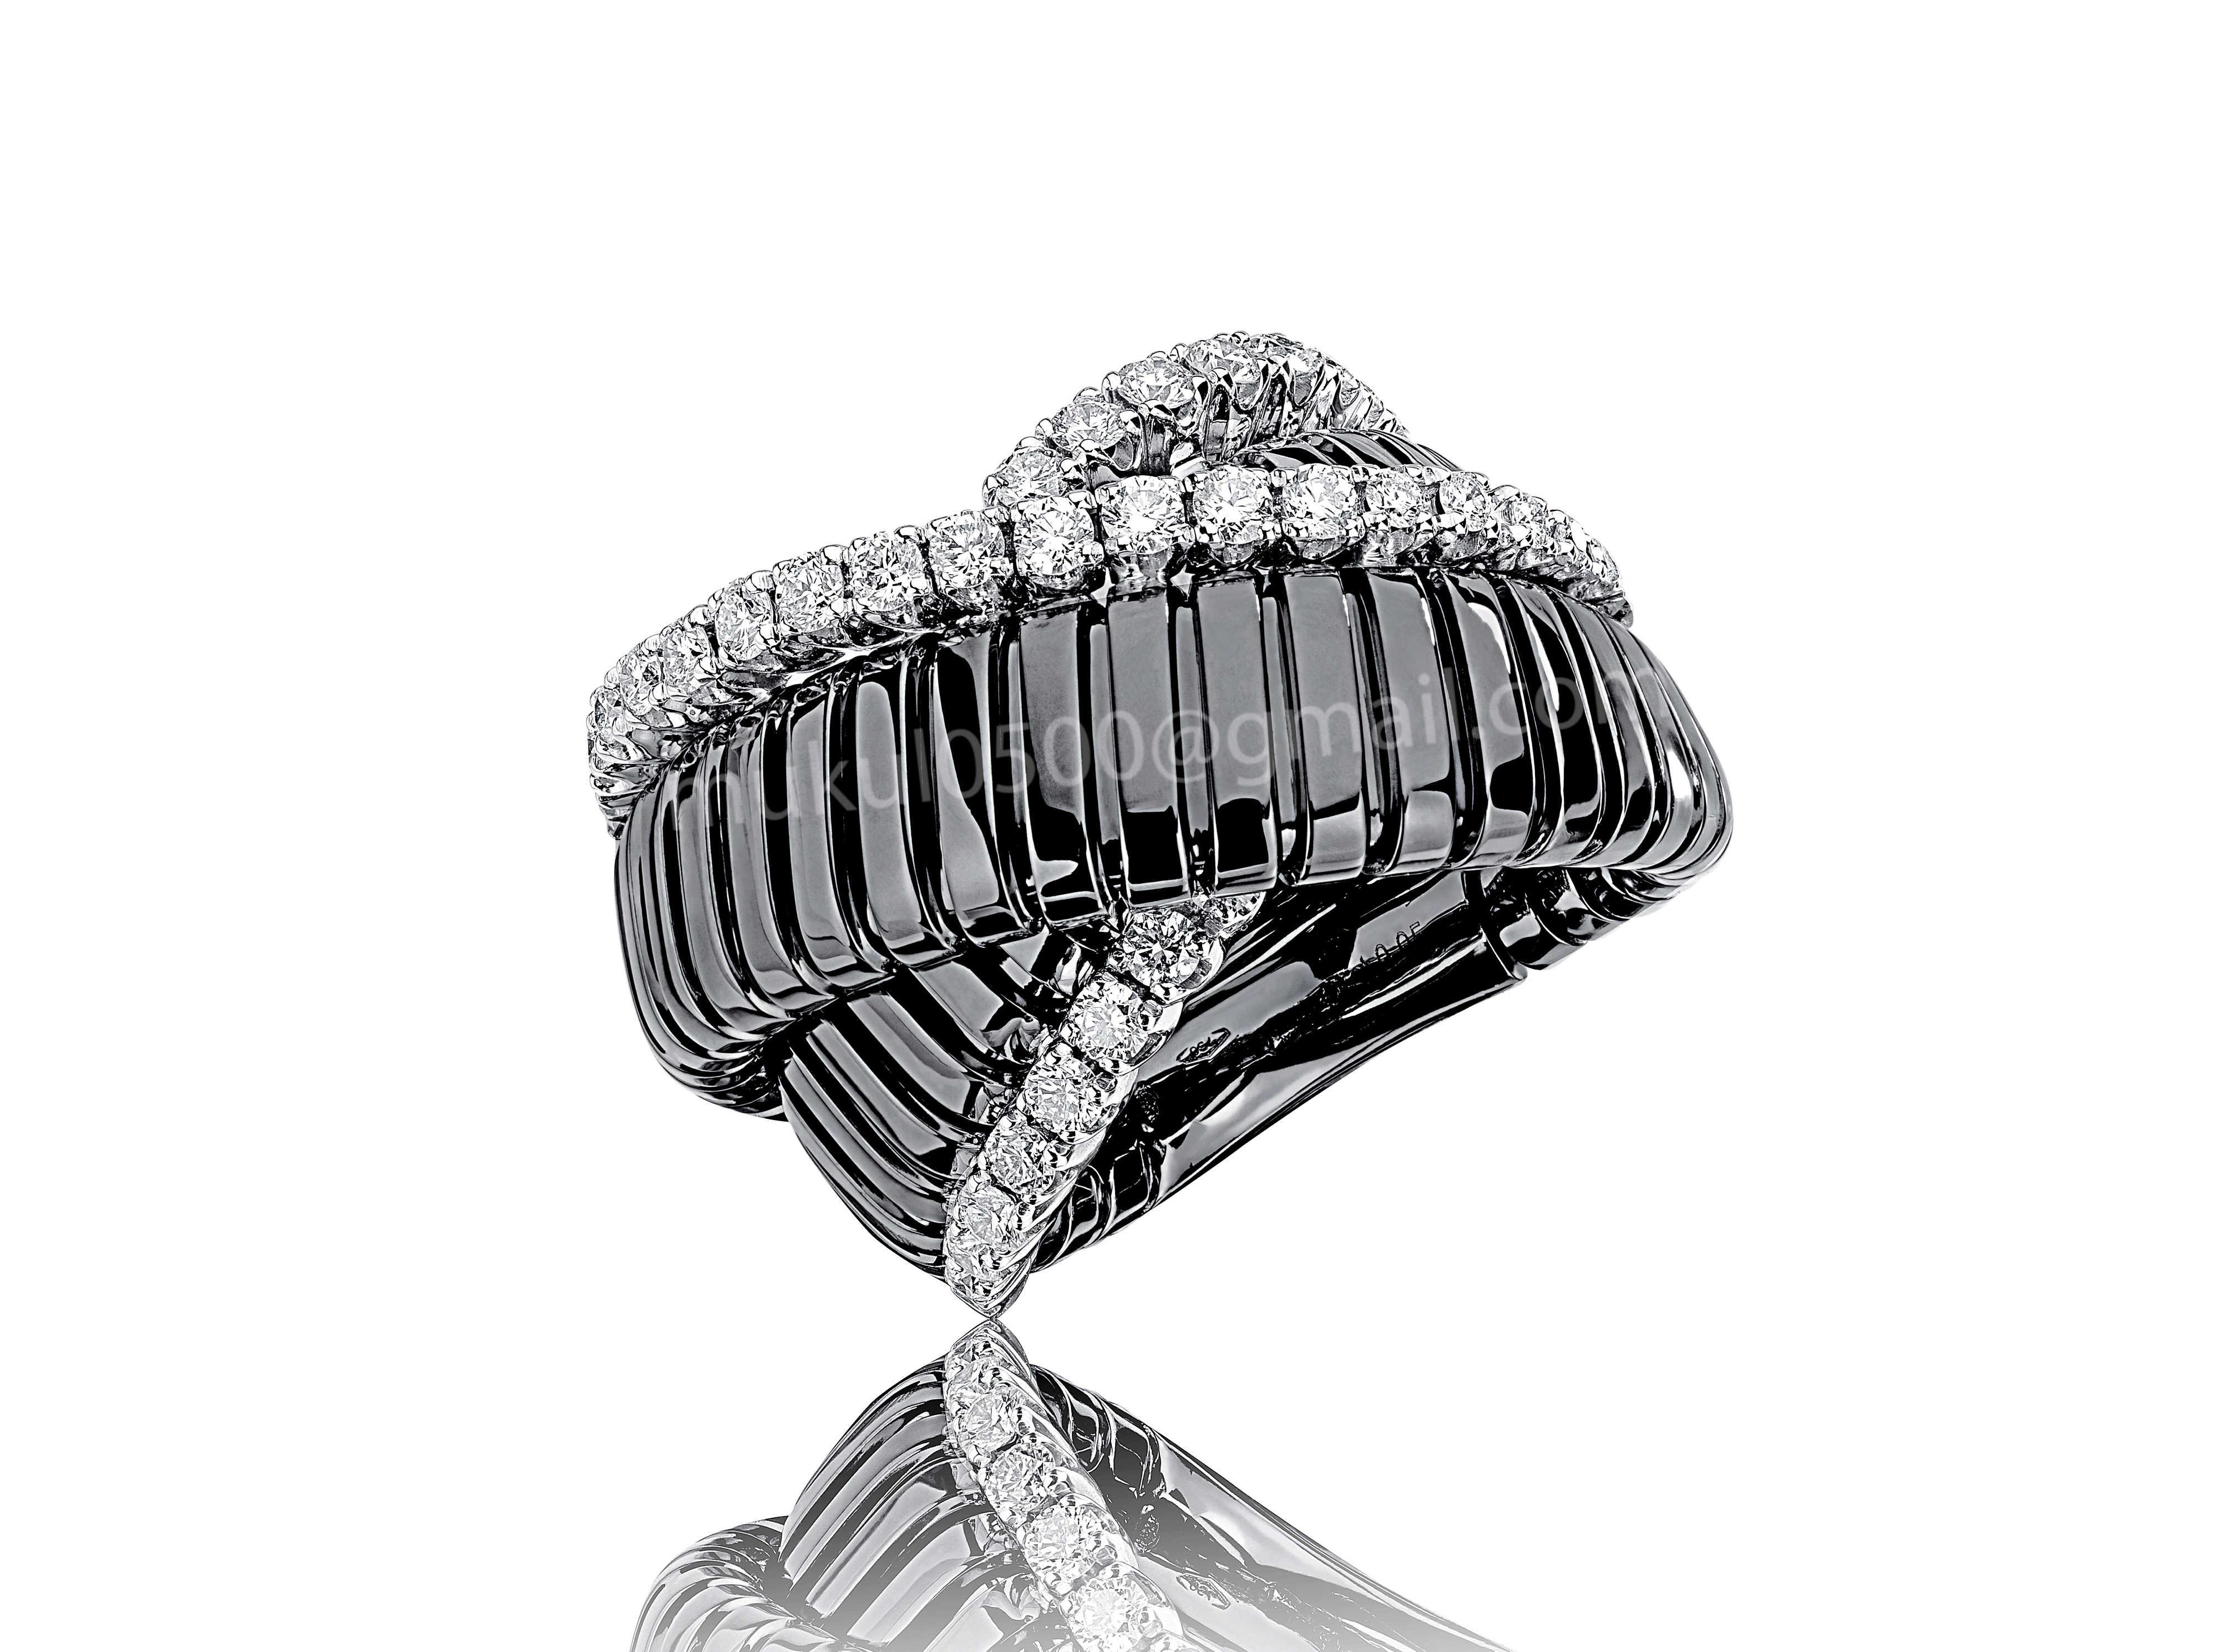 jewellery_retouch-01